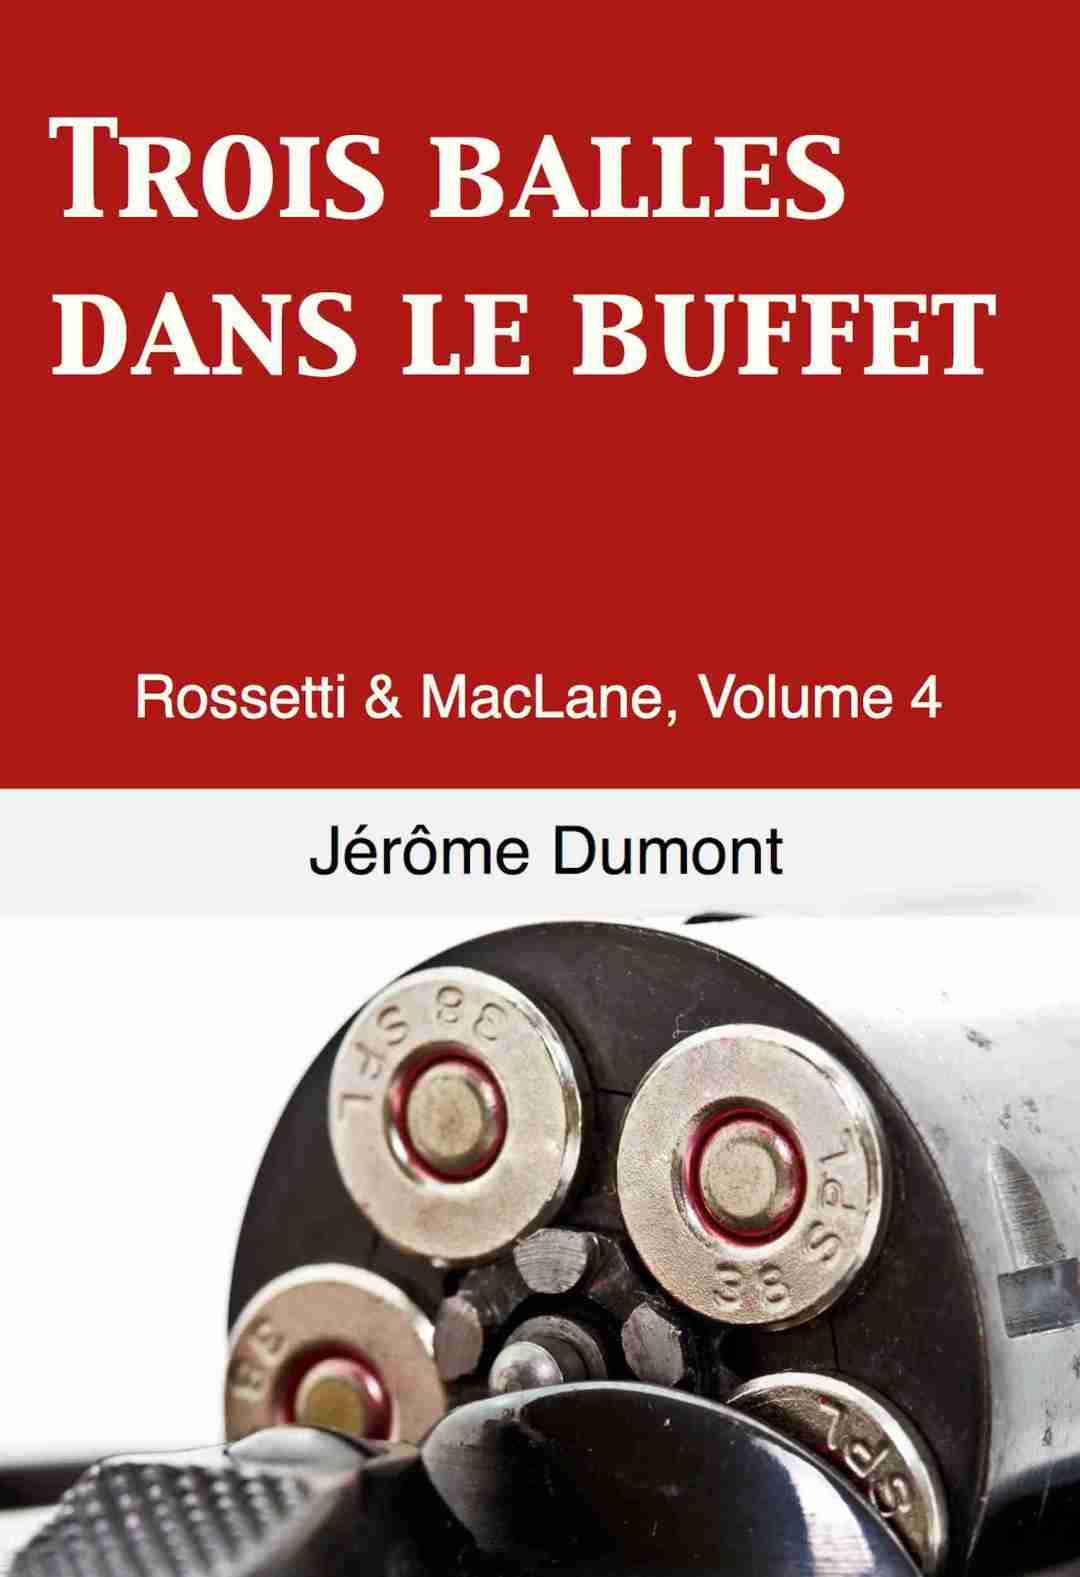 trois-balles-dans-le-buffet-rossetti-maclane-4